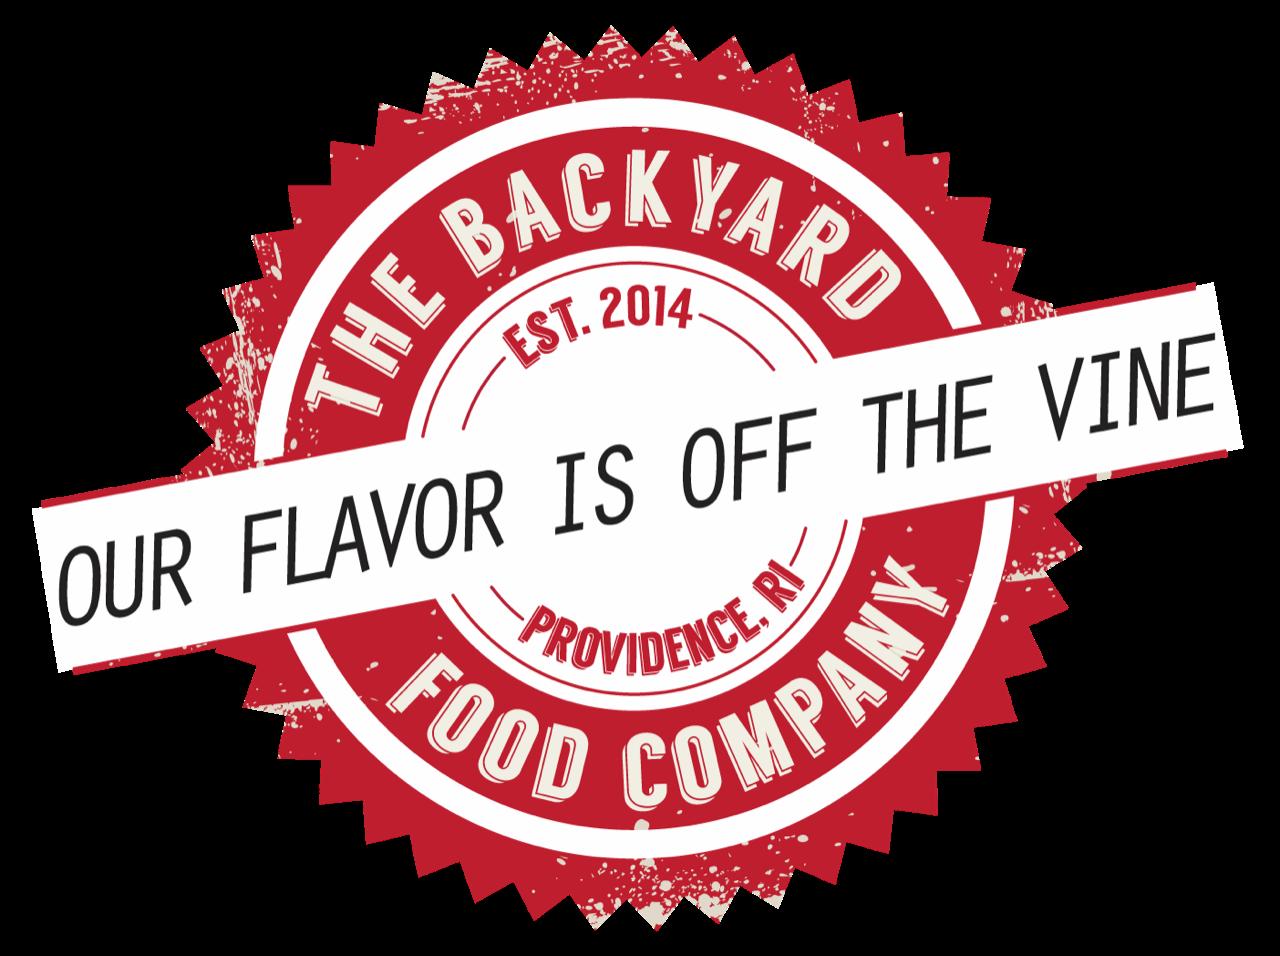 The Backyard Food Company.png